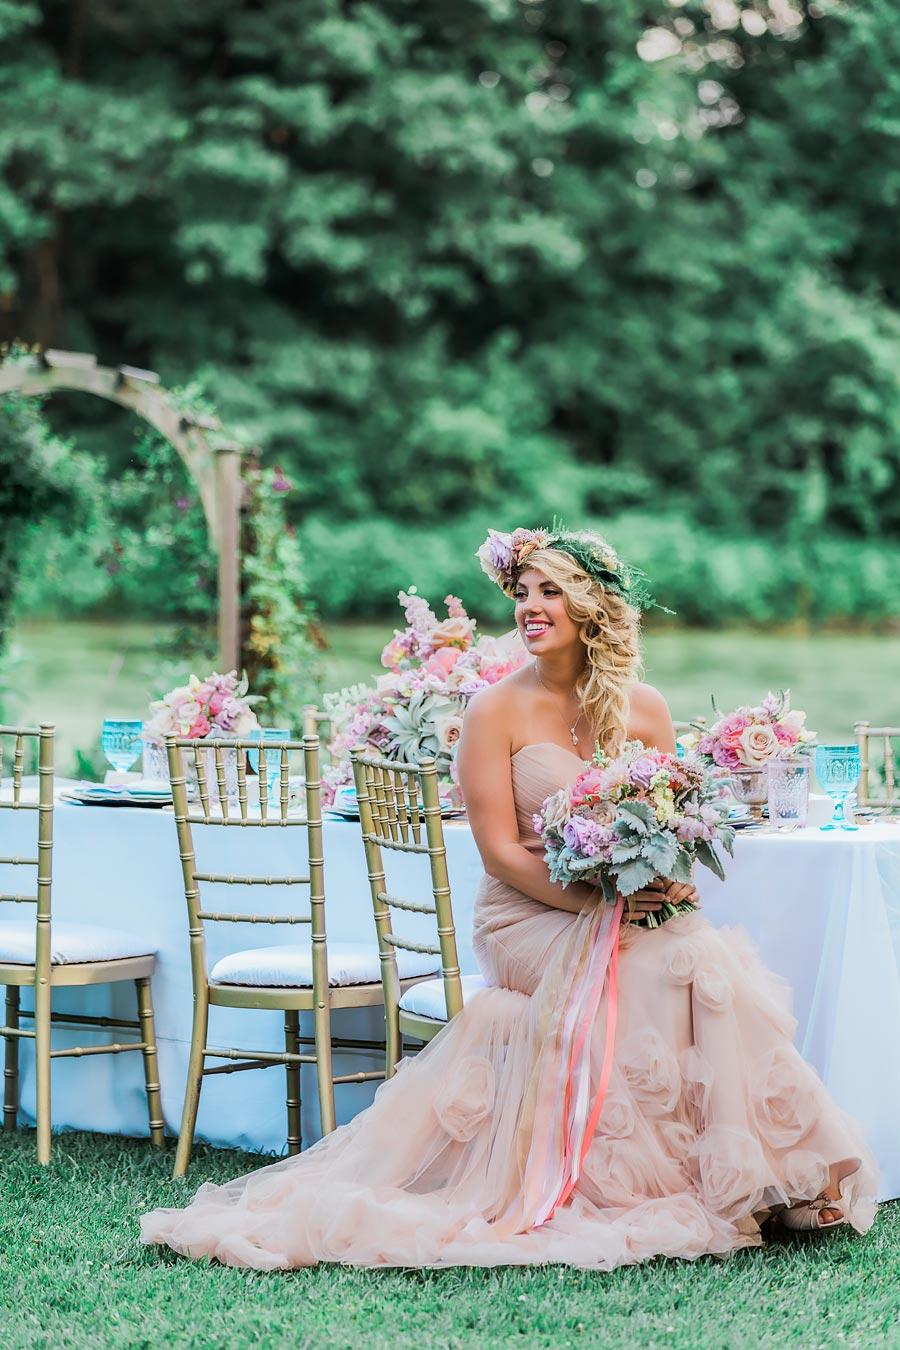 WeddingDay-Cover-Shoot08.jpg